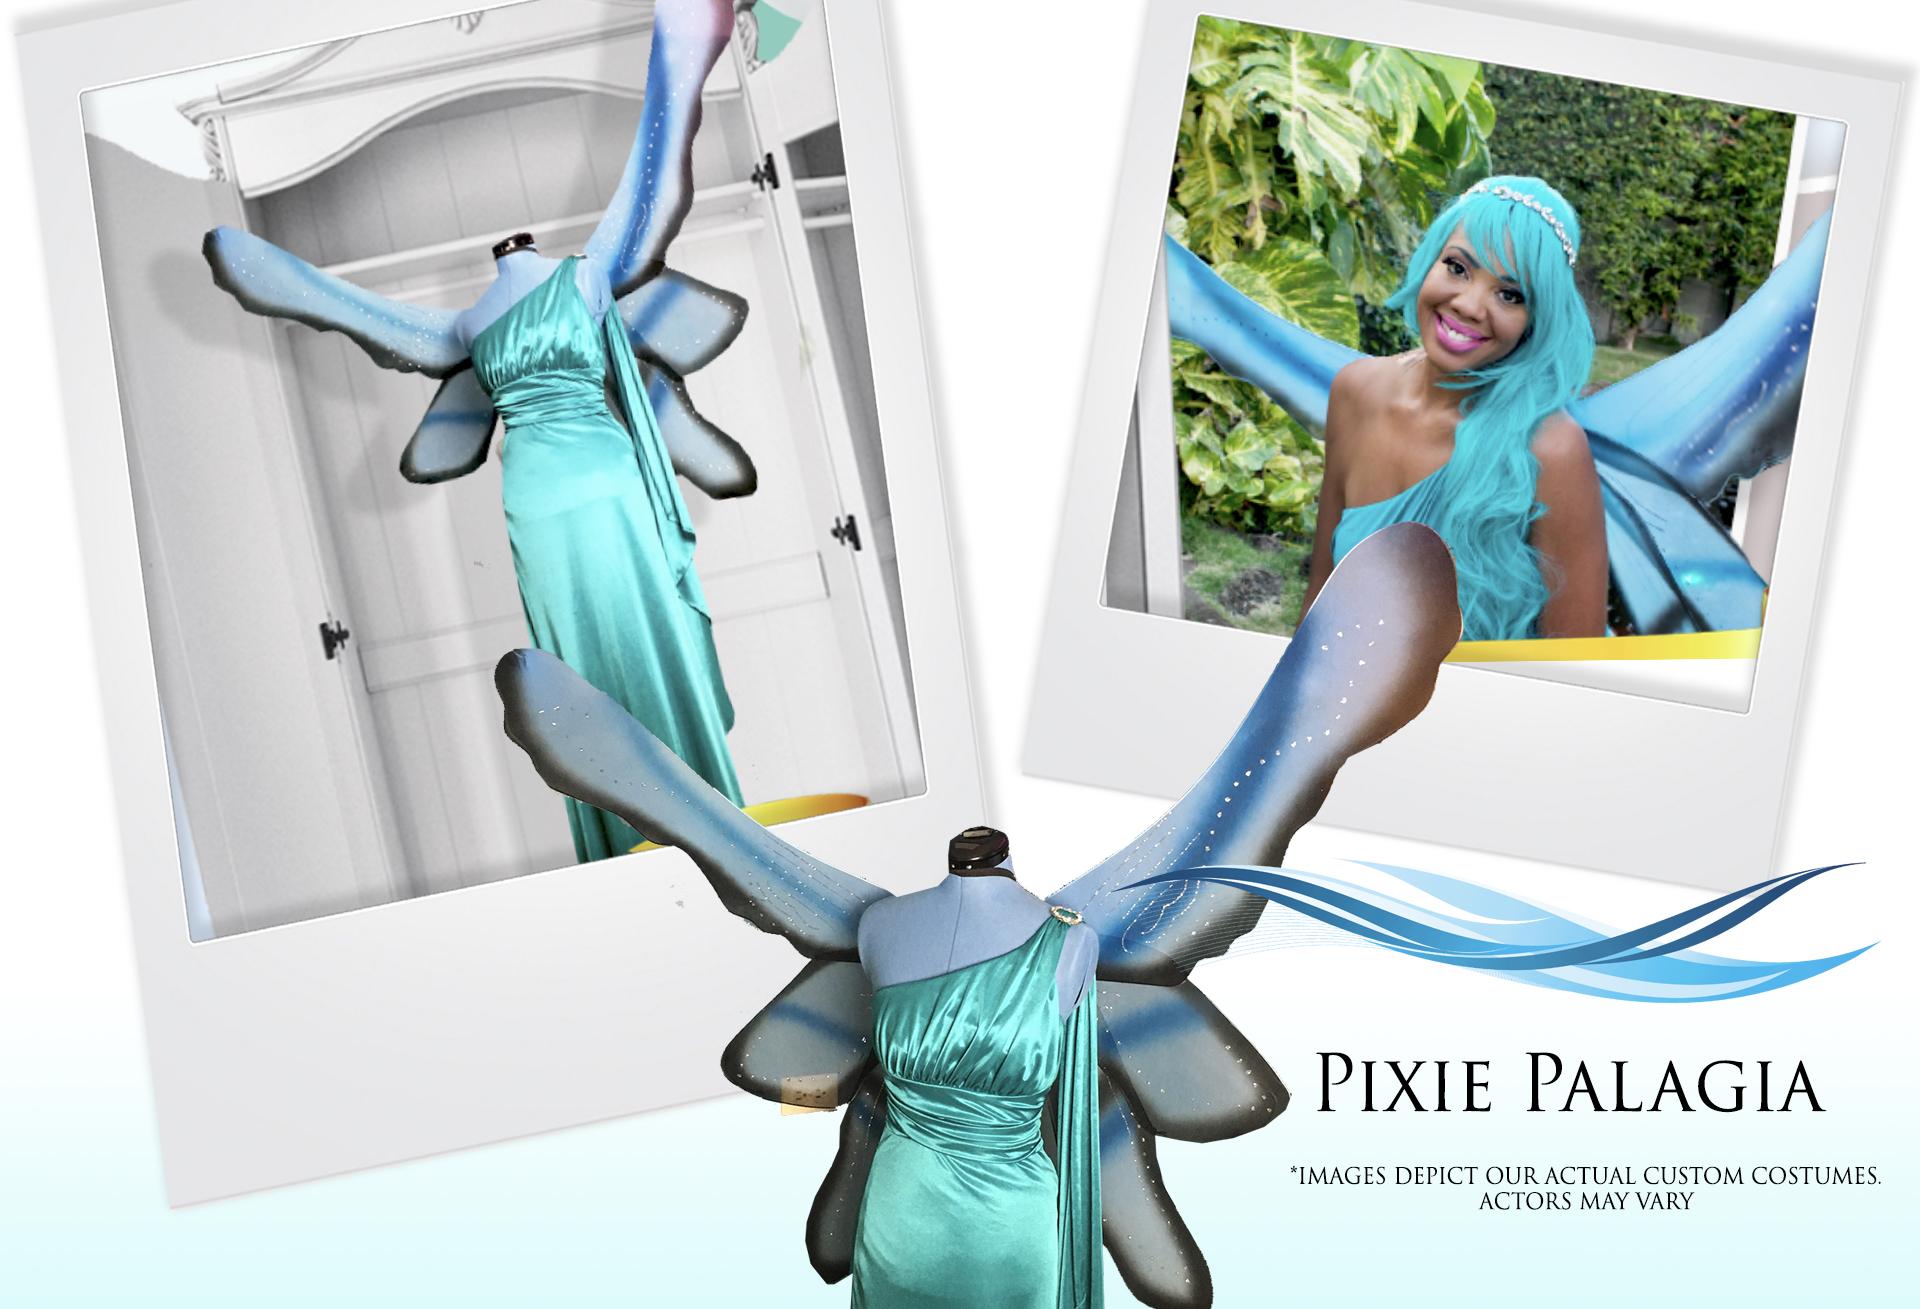 Pixie Palagia